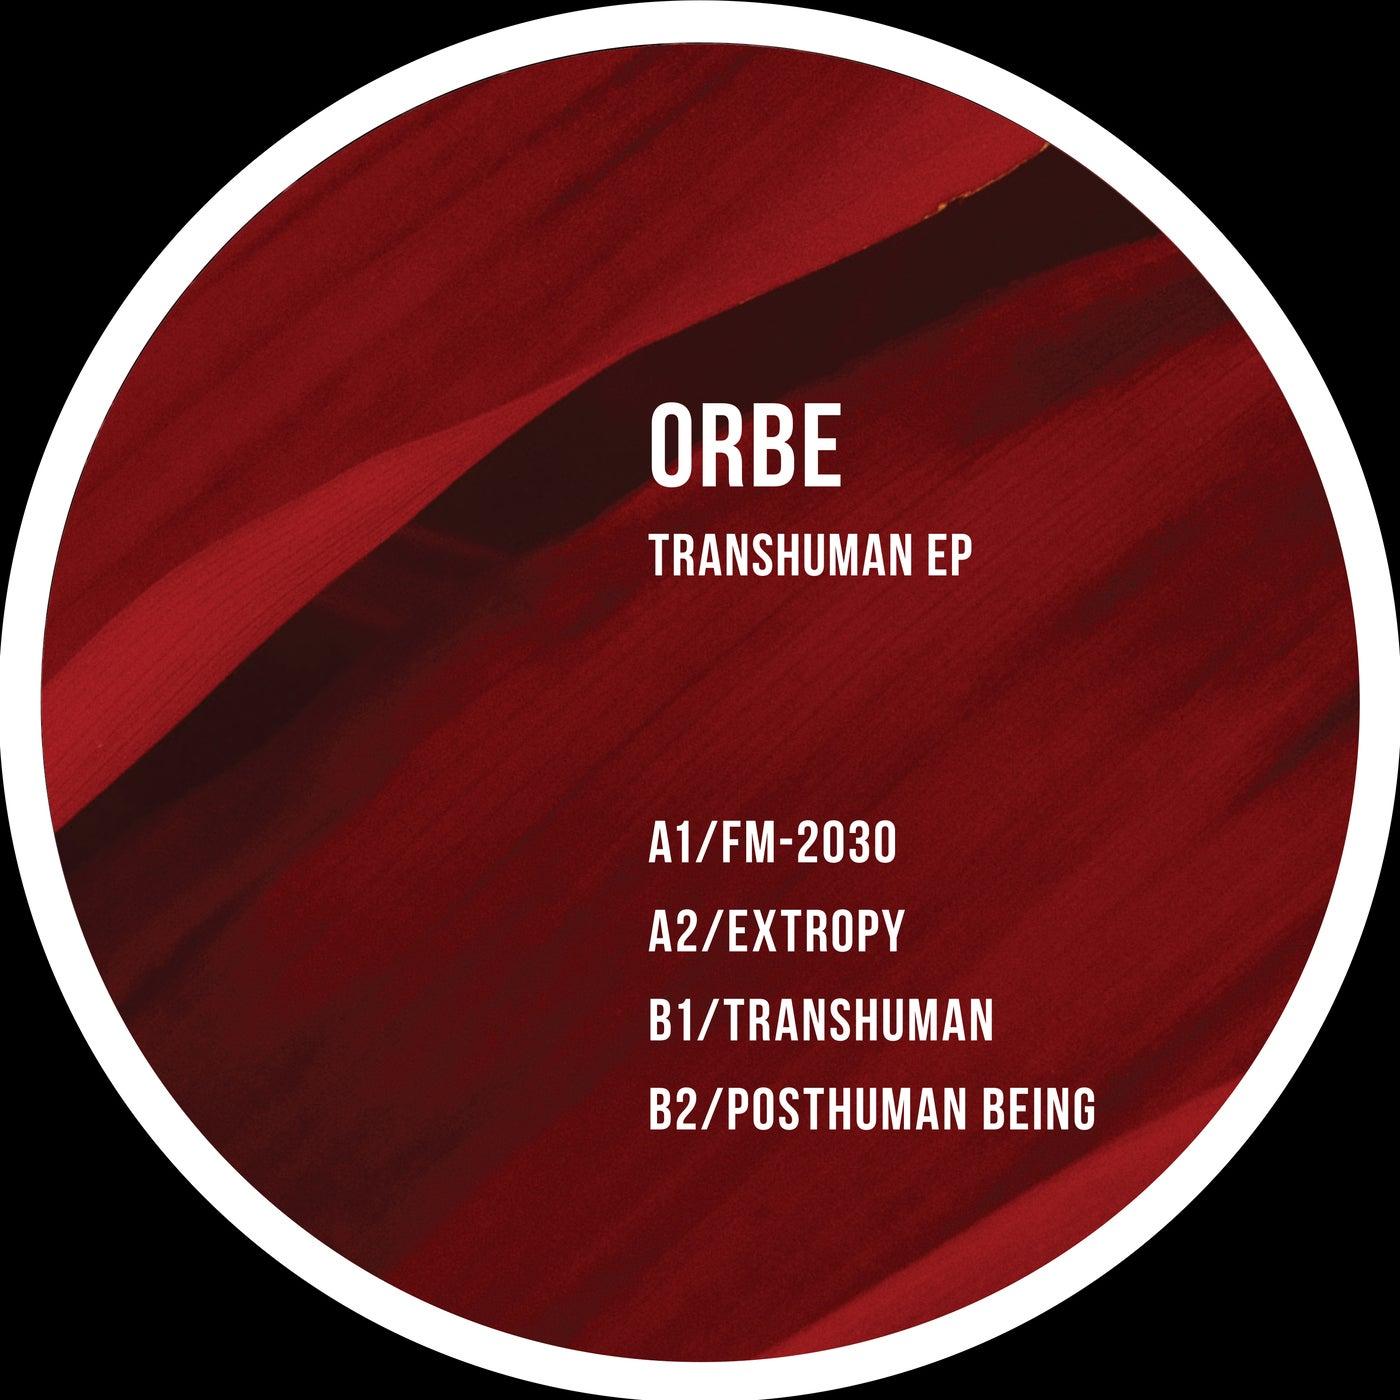 FM-2030 (Original Mix)